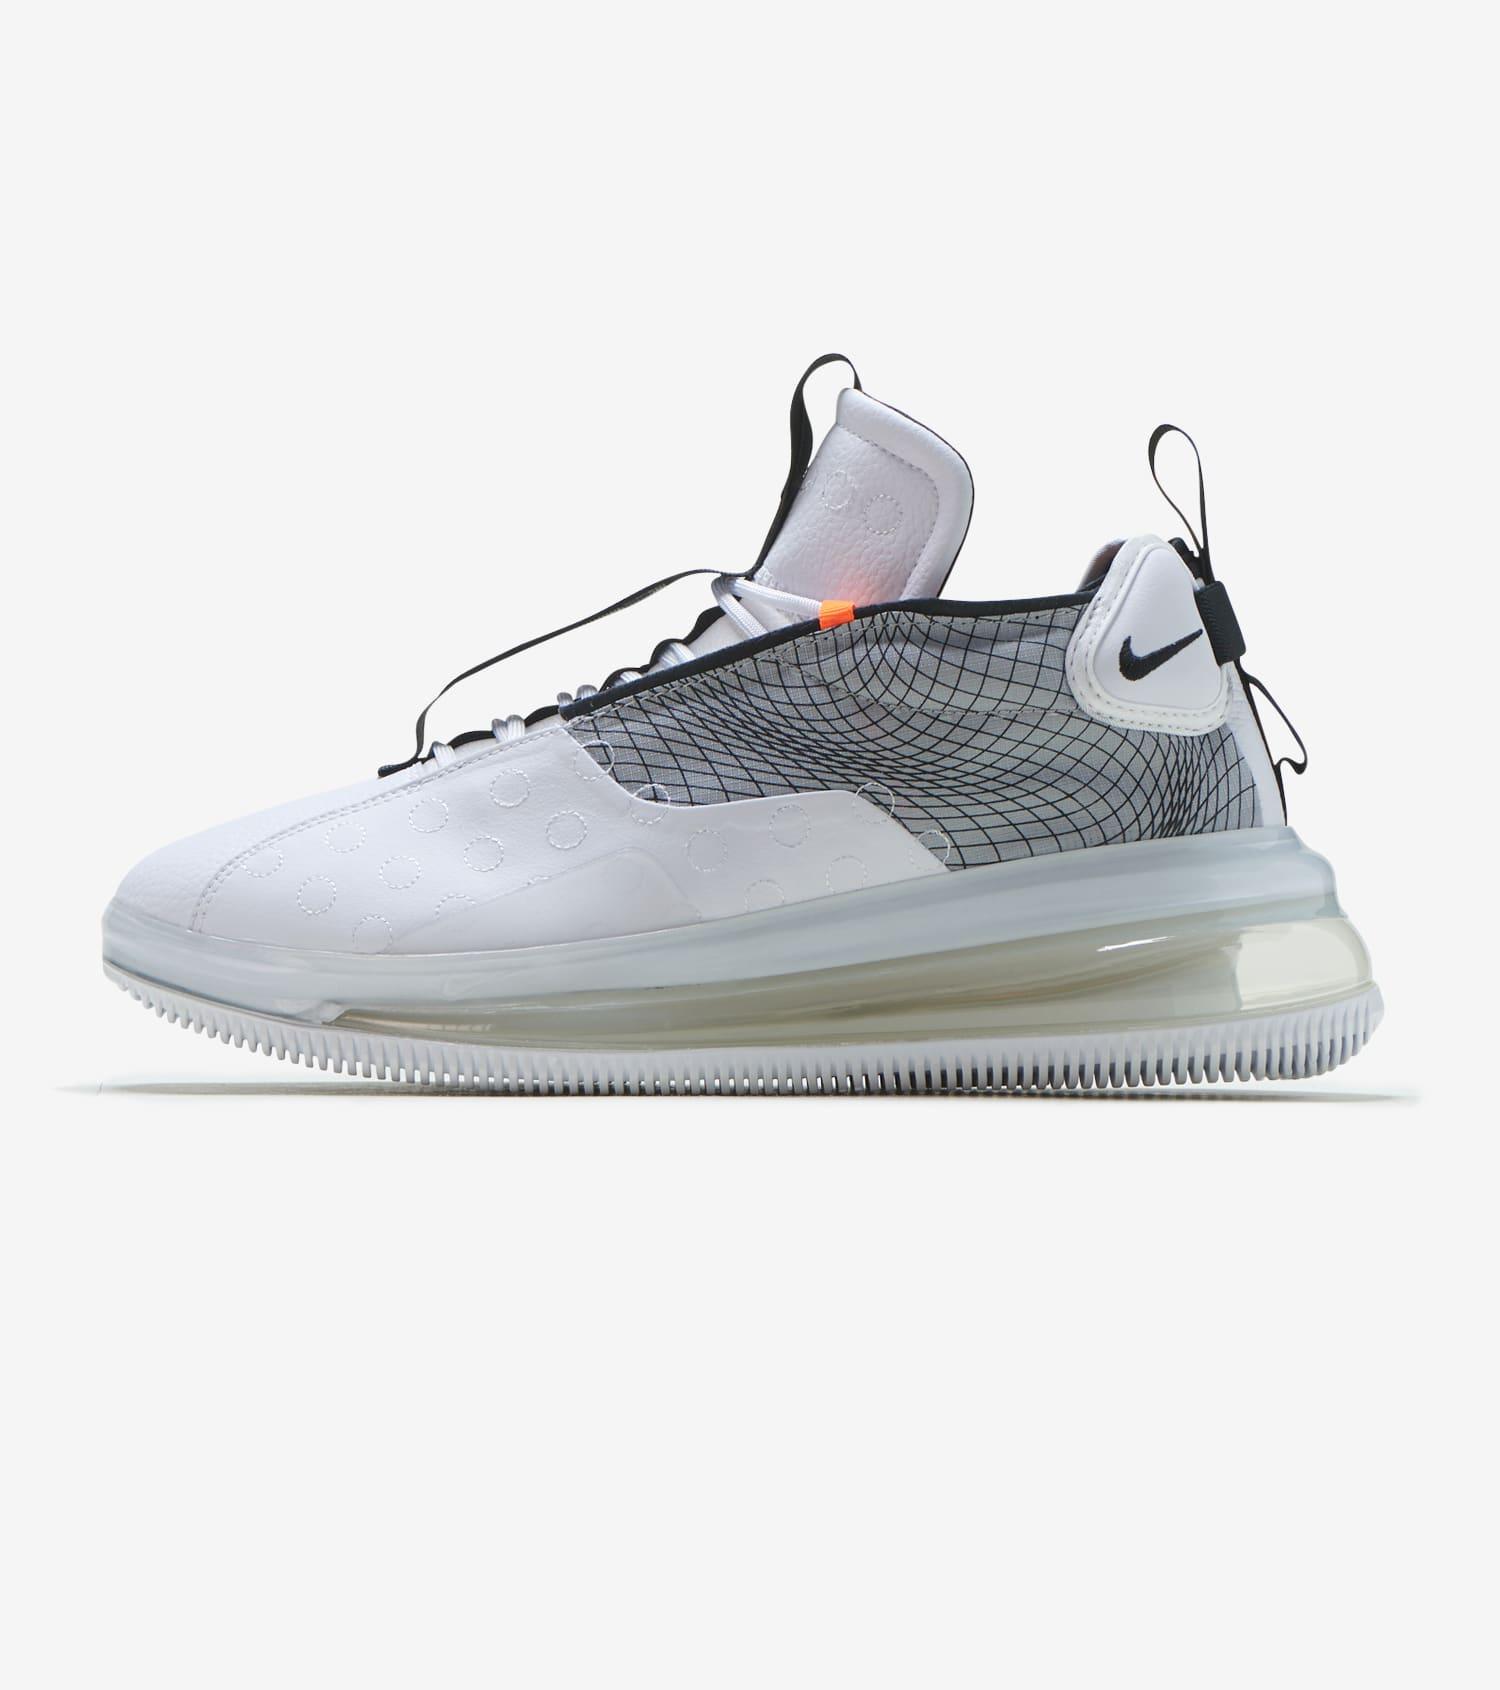 Nike Air Max 720 Waves (White) BQ4430 100 | Jimmy Jazz